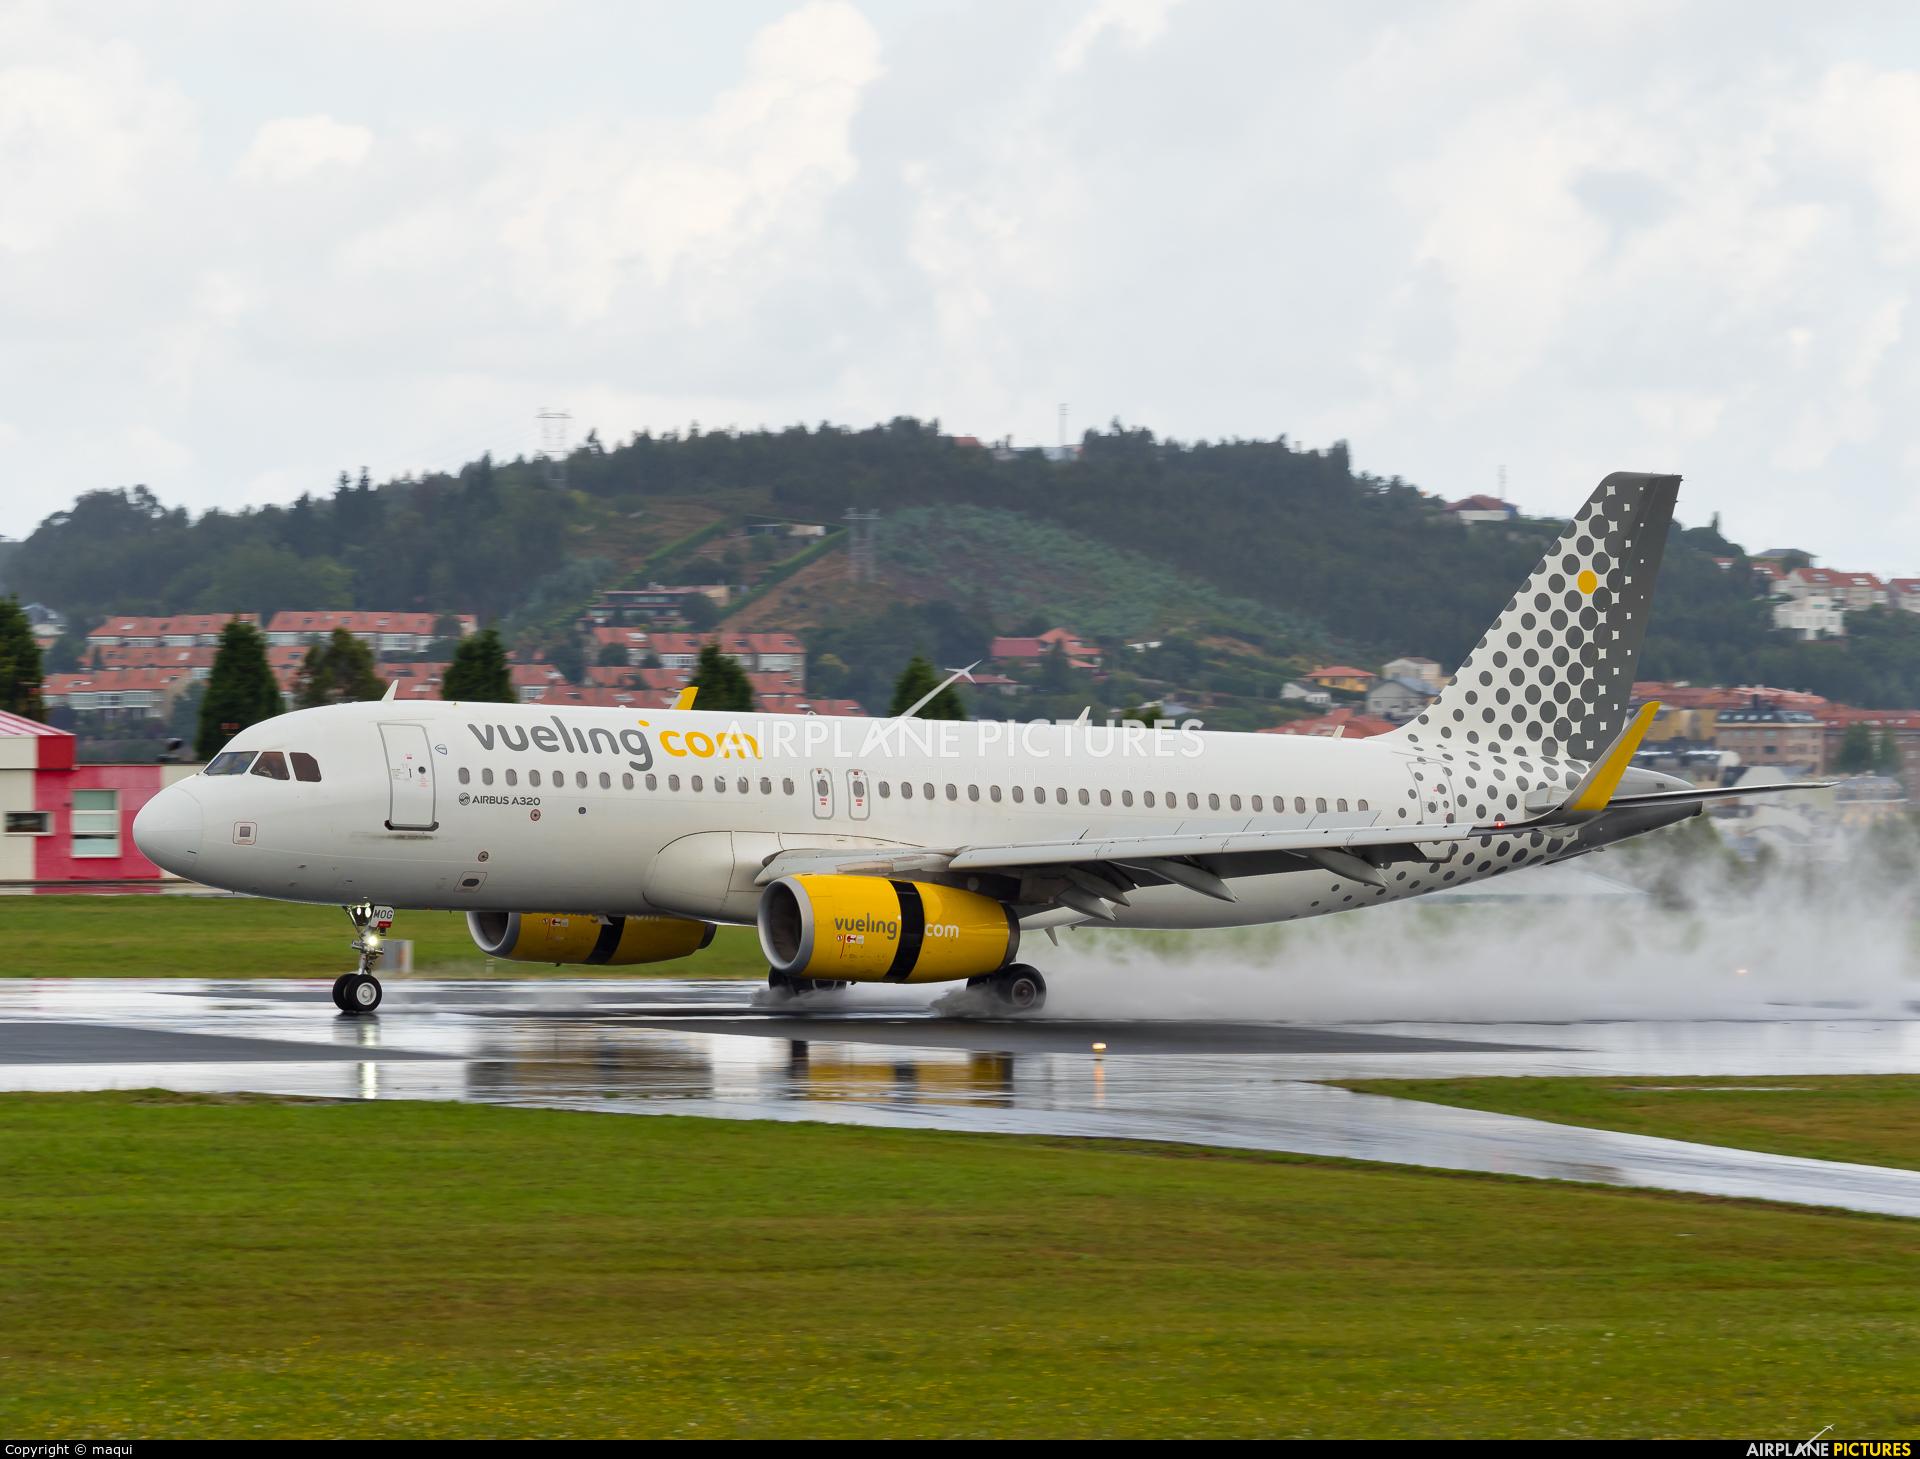 Vueling Airlines EC-MOG aircraft at La Coruña